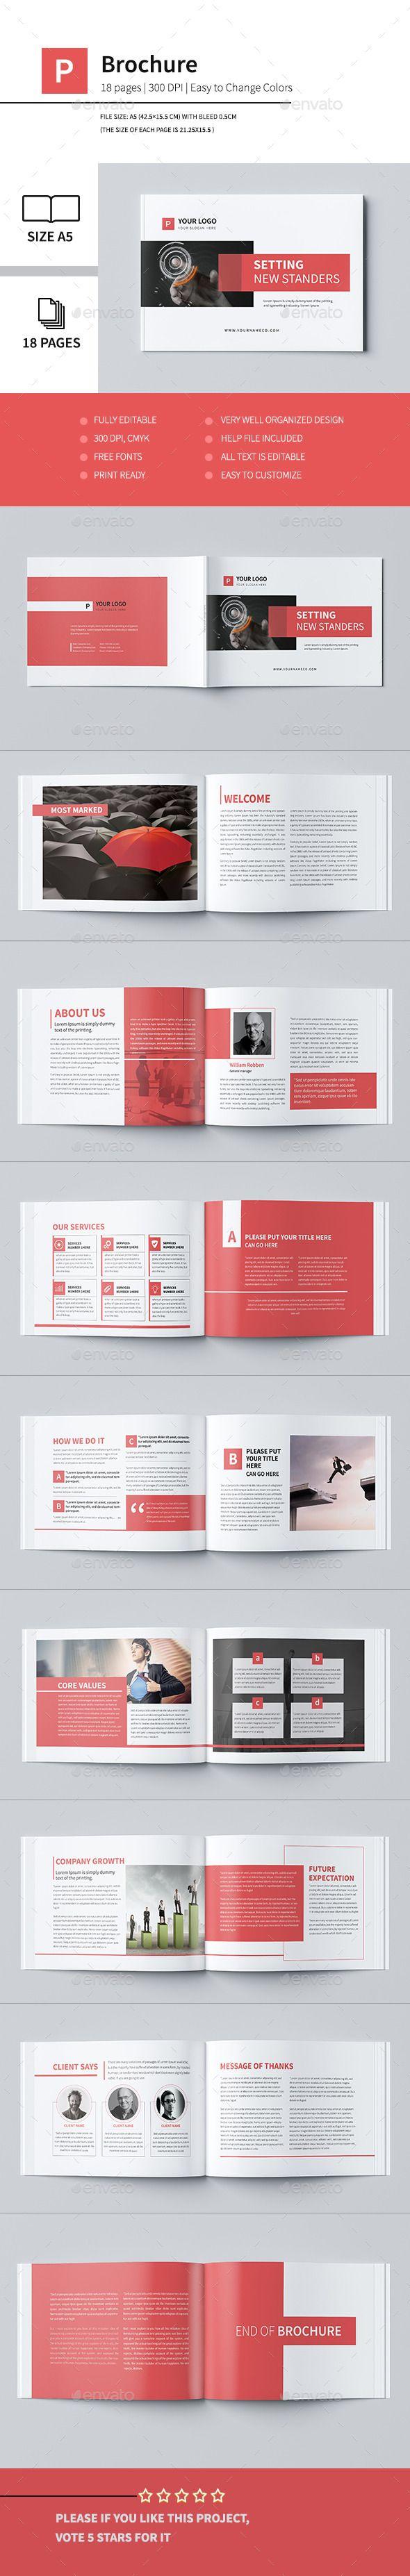 Minimal Business Brochure Template #brochure #design Download: http ...